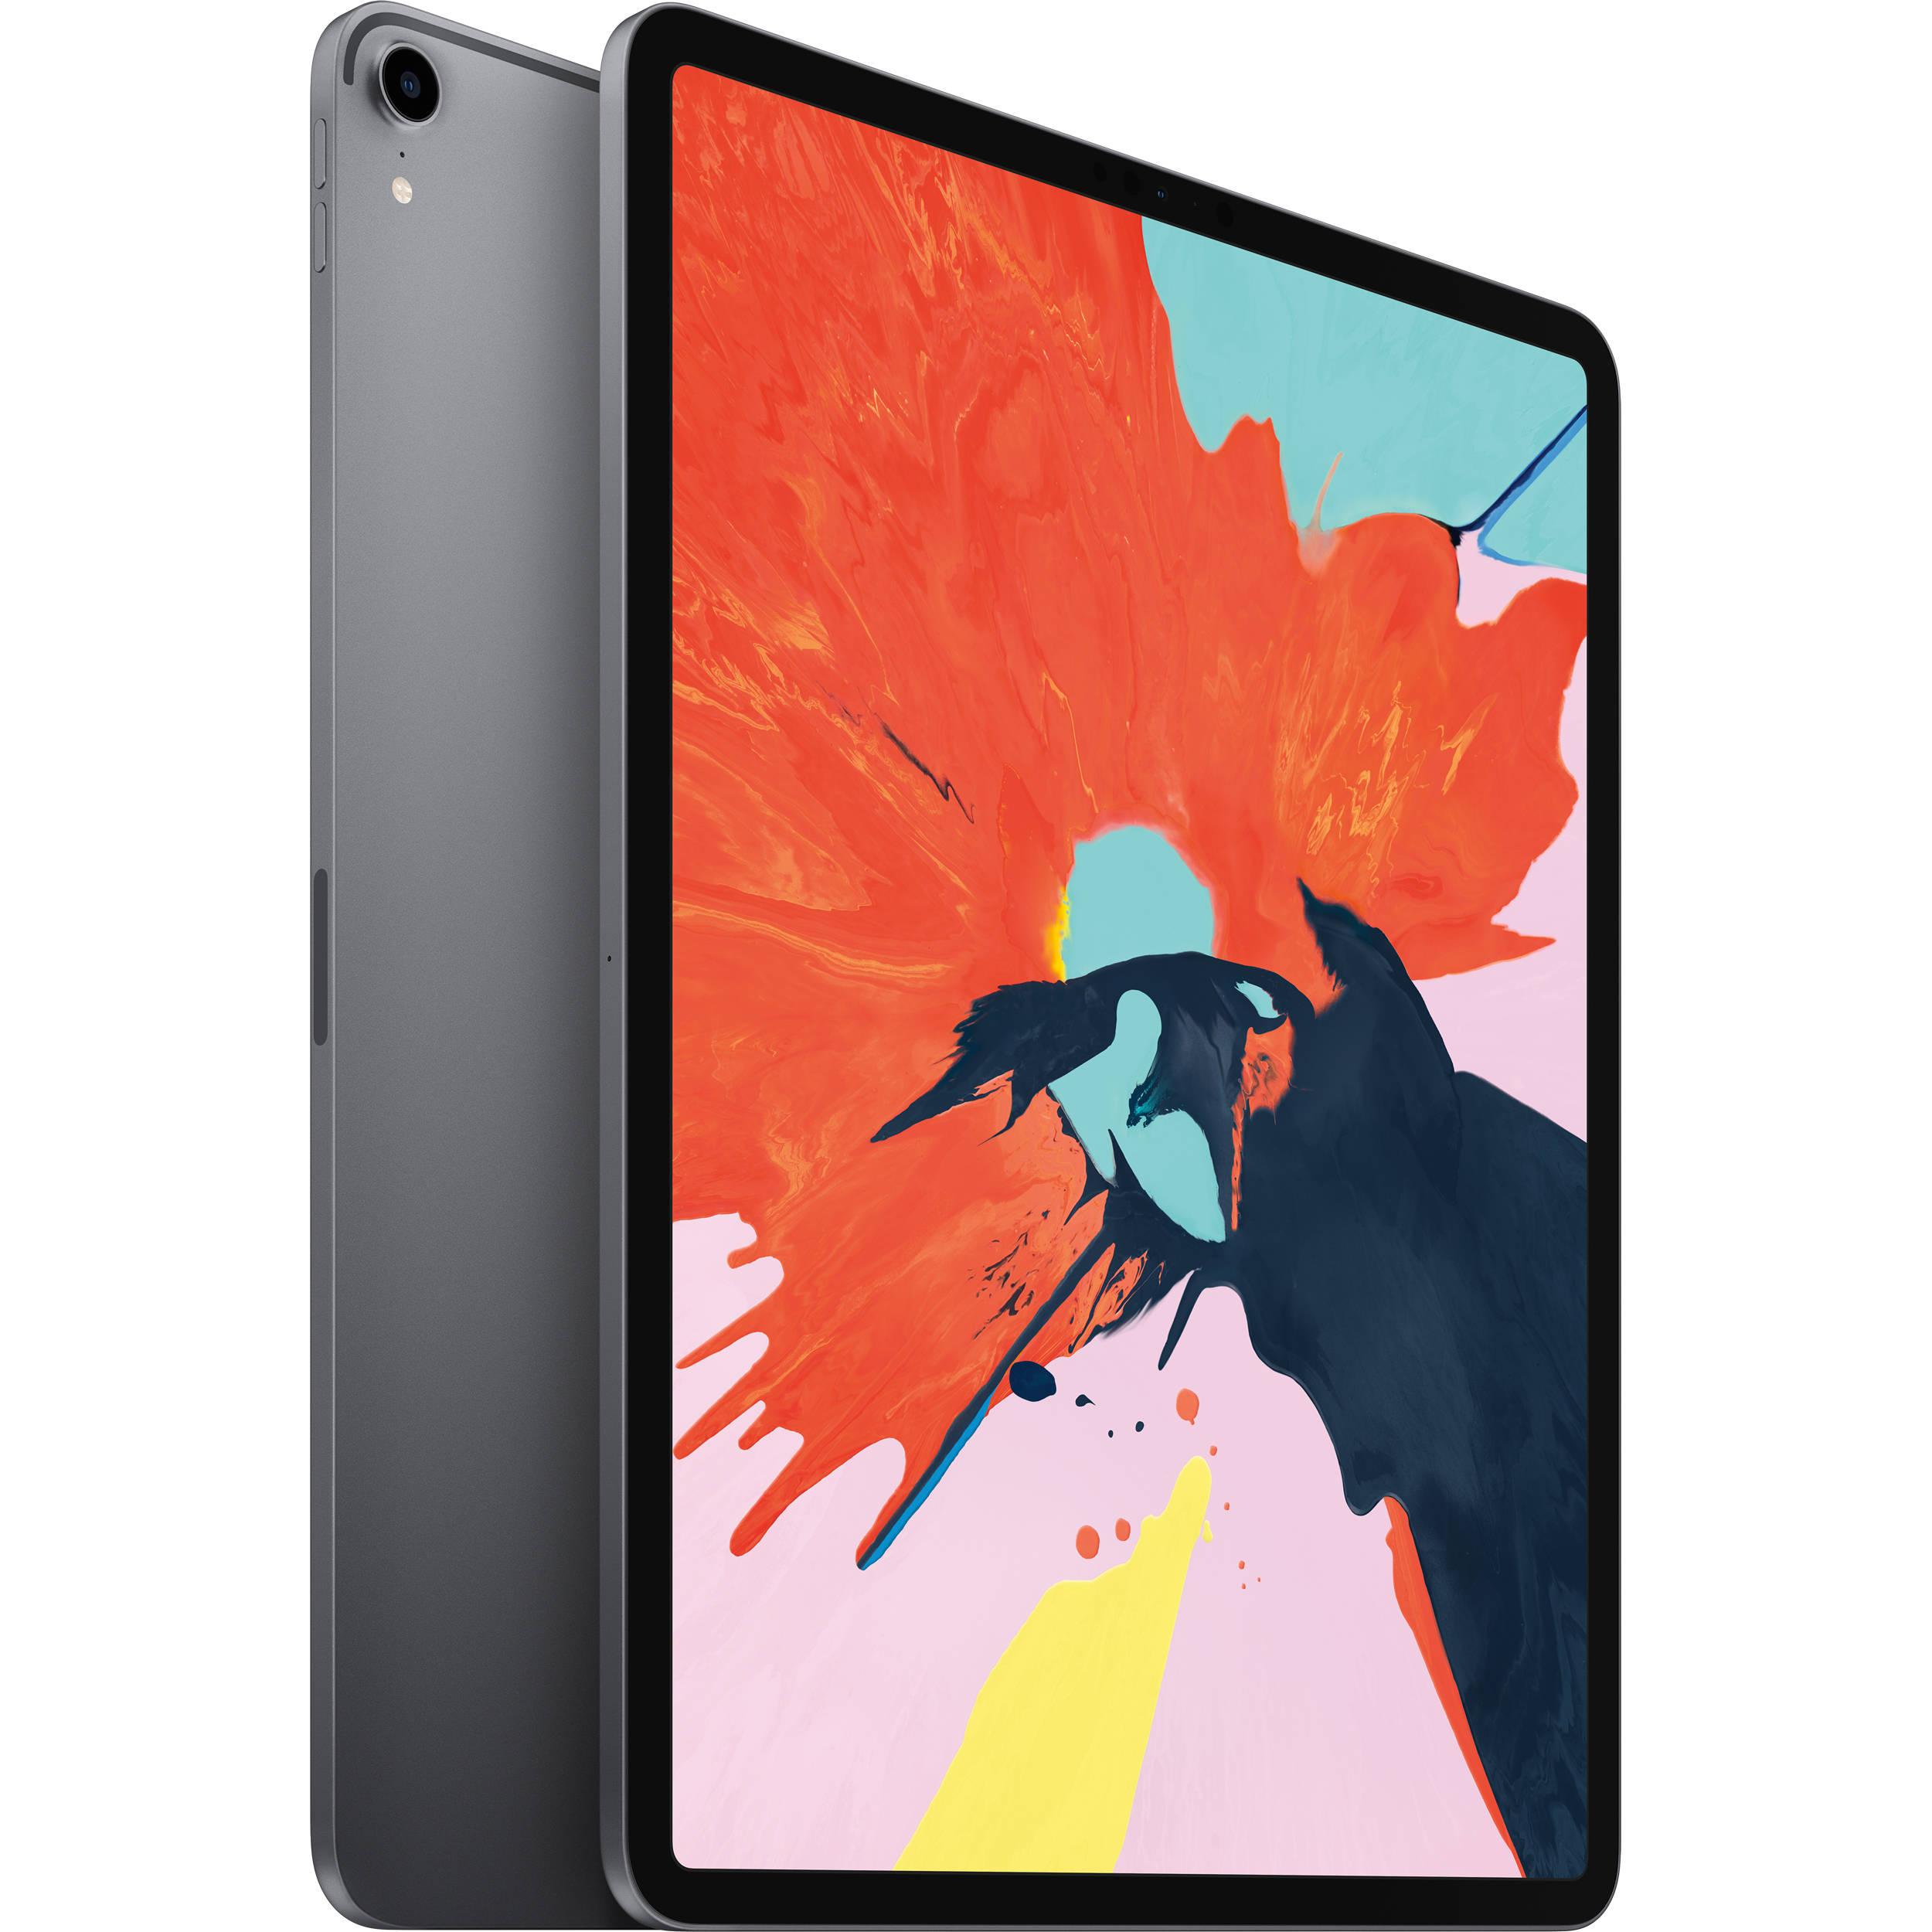 Apple iPad Pro 2018 - 12.9 - 64GB - WiFi + Cellular [Amazon Primeday UK]